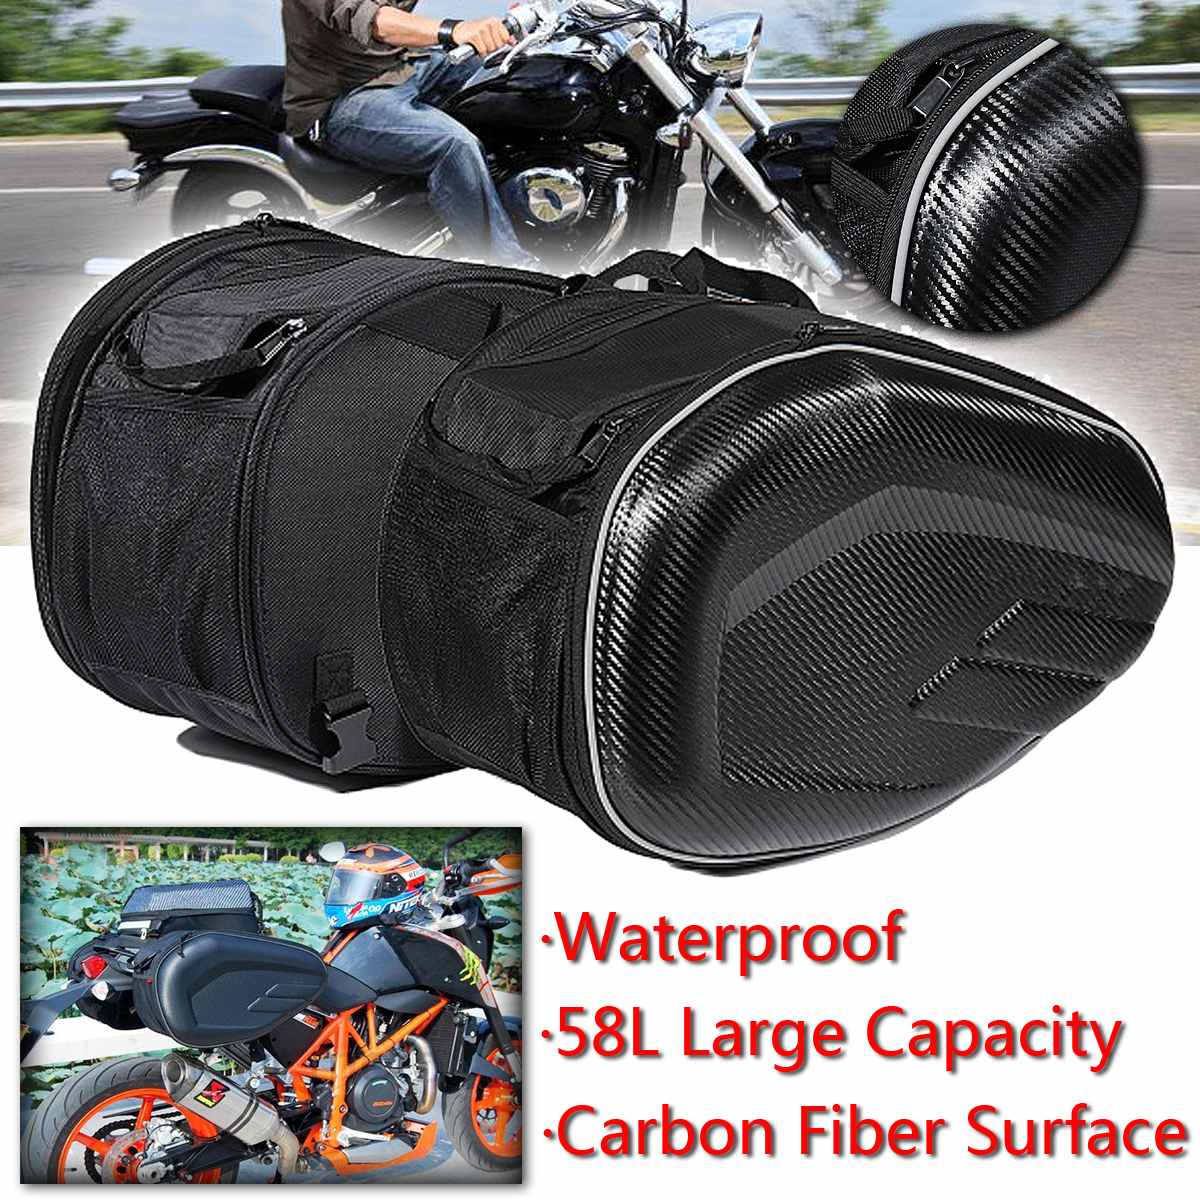 9662796a1b 58L Motorcycle Waterproof Racing Race Moto Helmet Travel Bags Suitcase  Saddlebags and Raincoat for Motorbike Tool